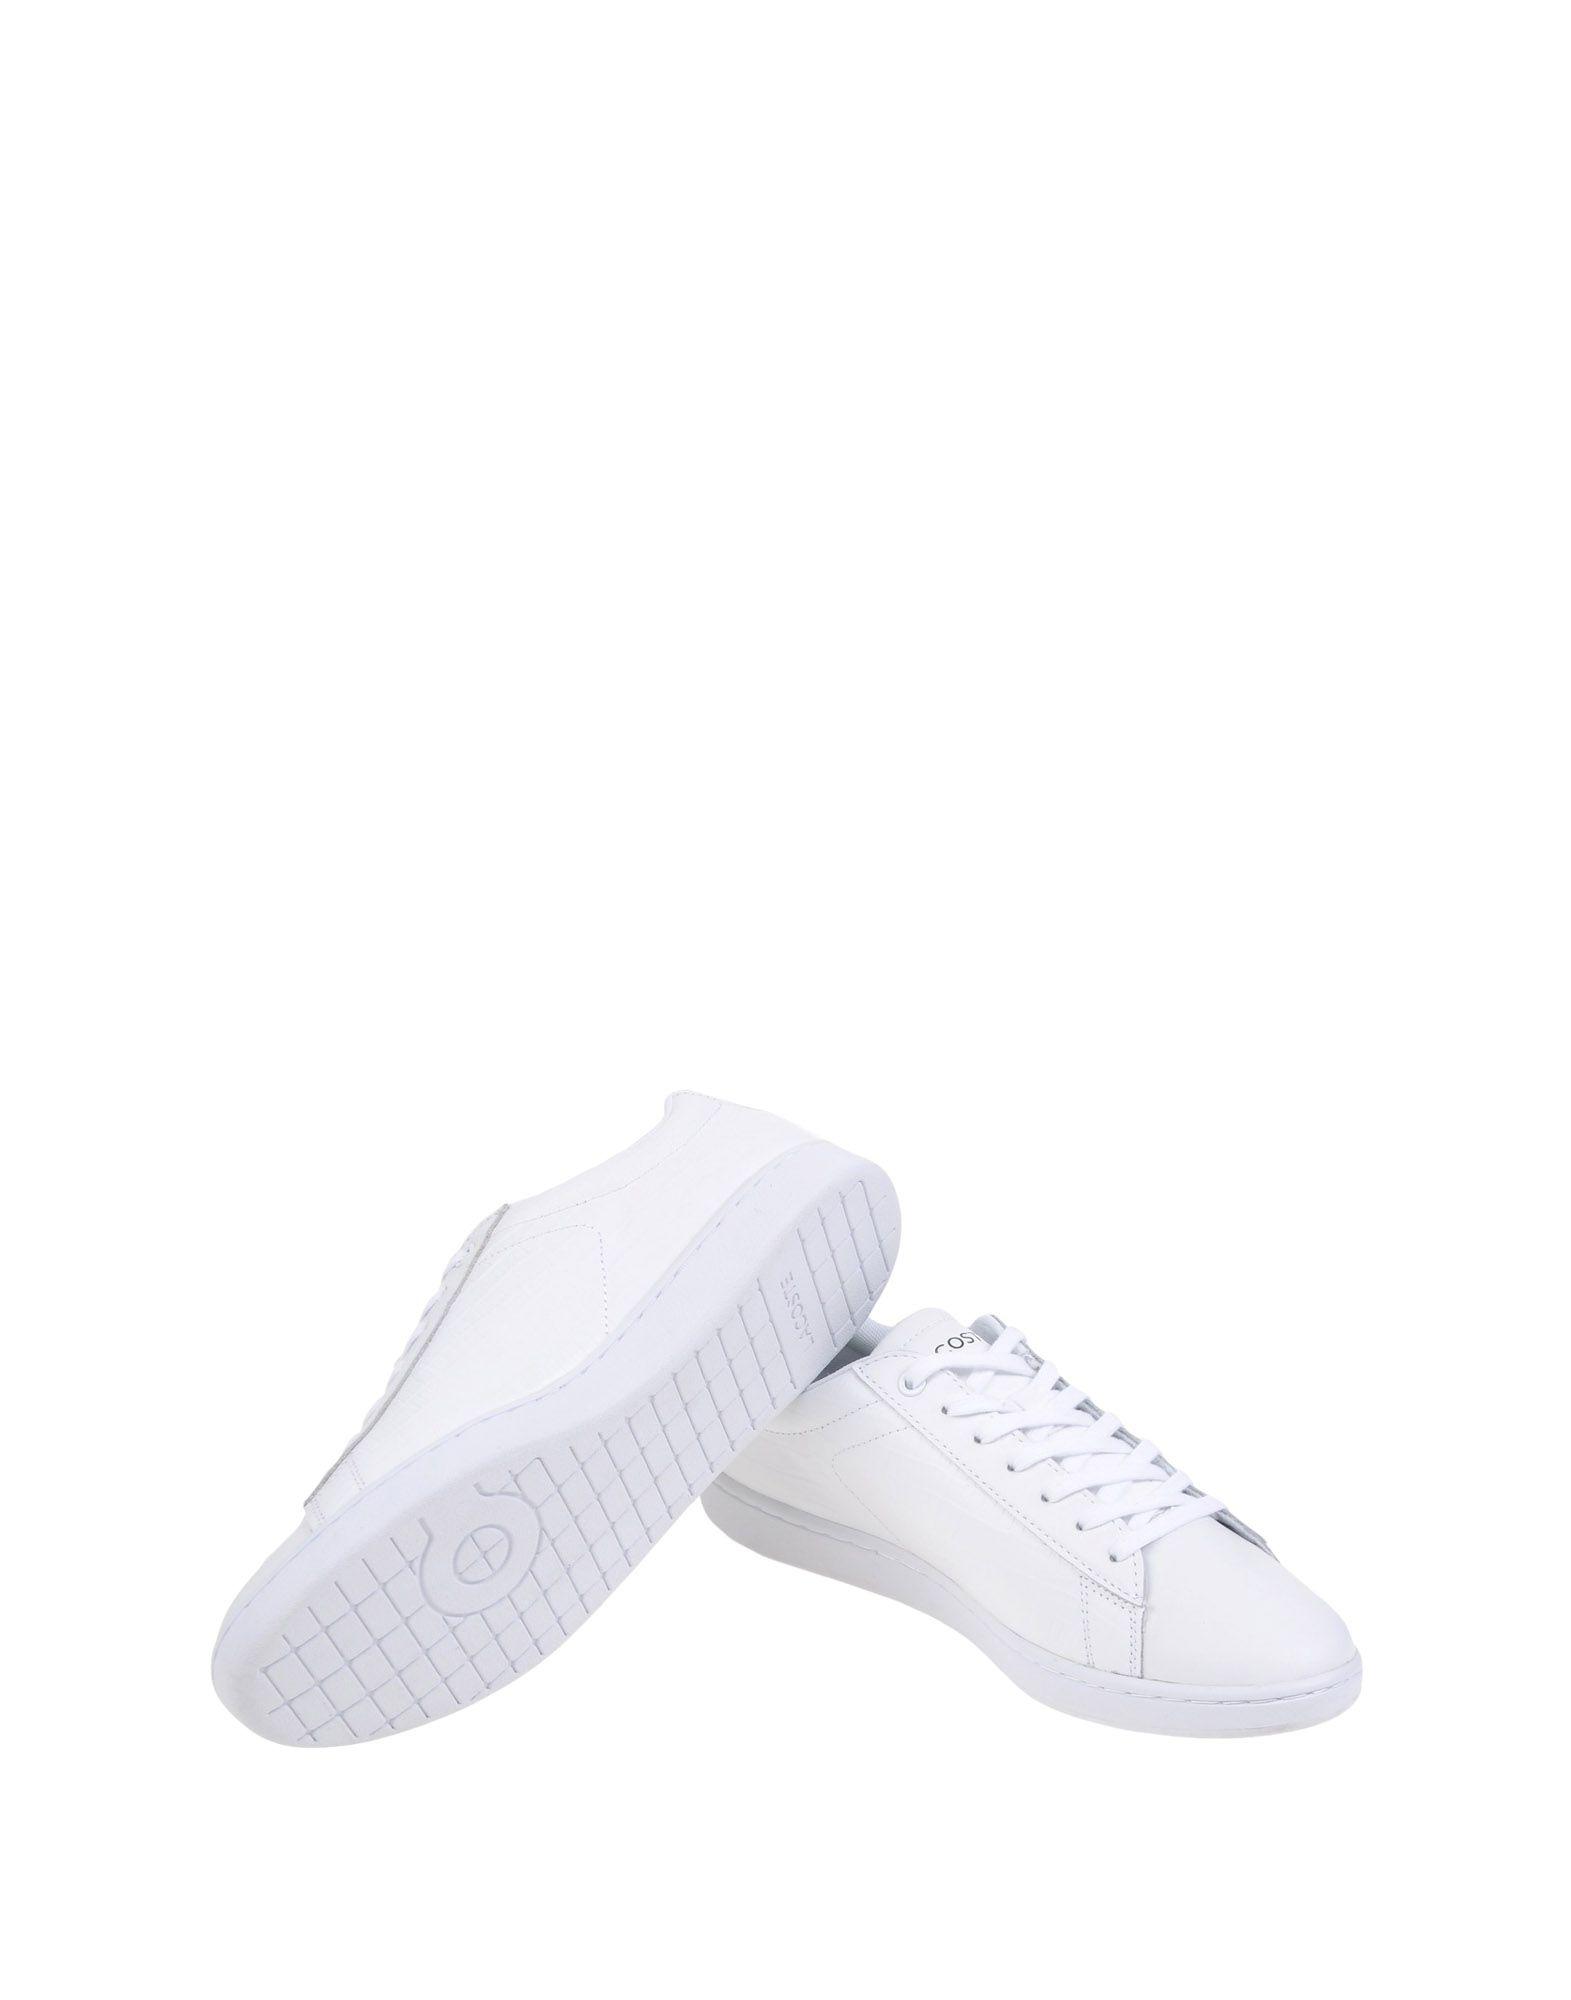 c4ba0bea1 ... Lacoste Lacoste Lacoste Carnaby Evo G316 7 - Sneakers - Men Lacoste  Sneakers online on United